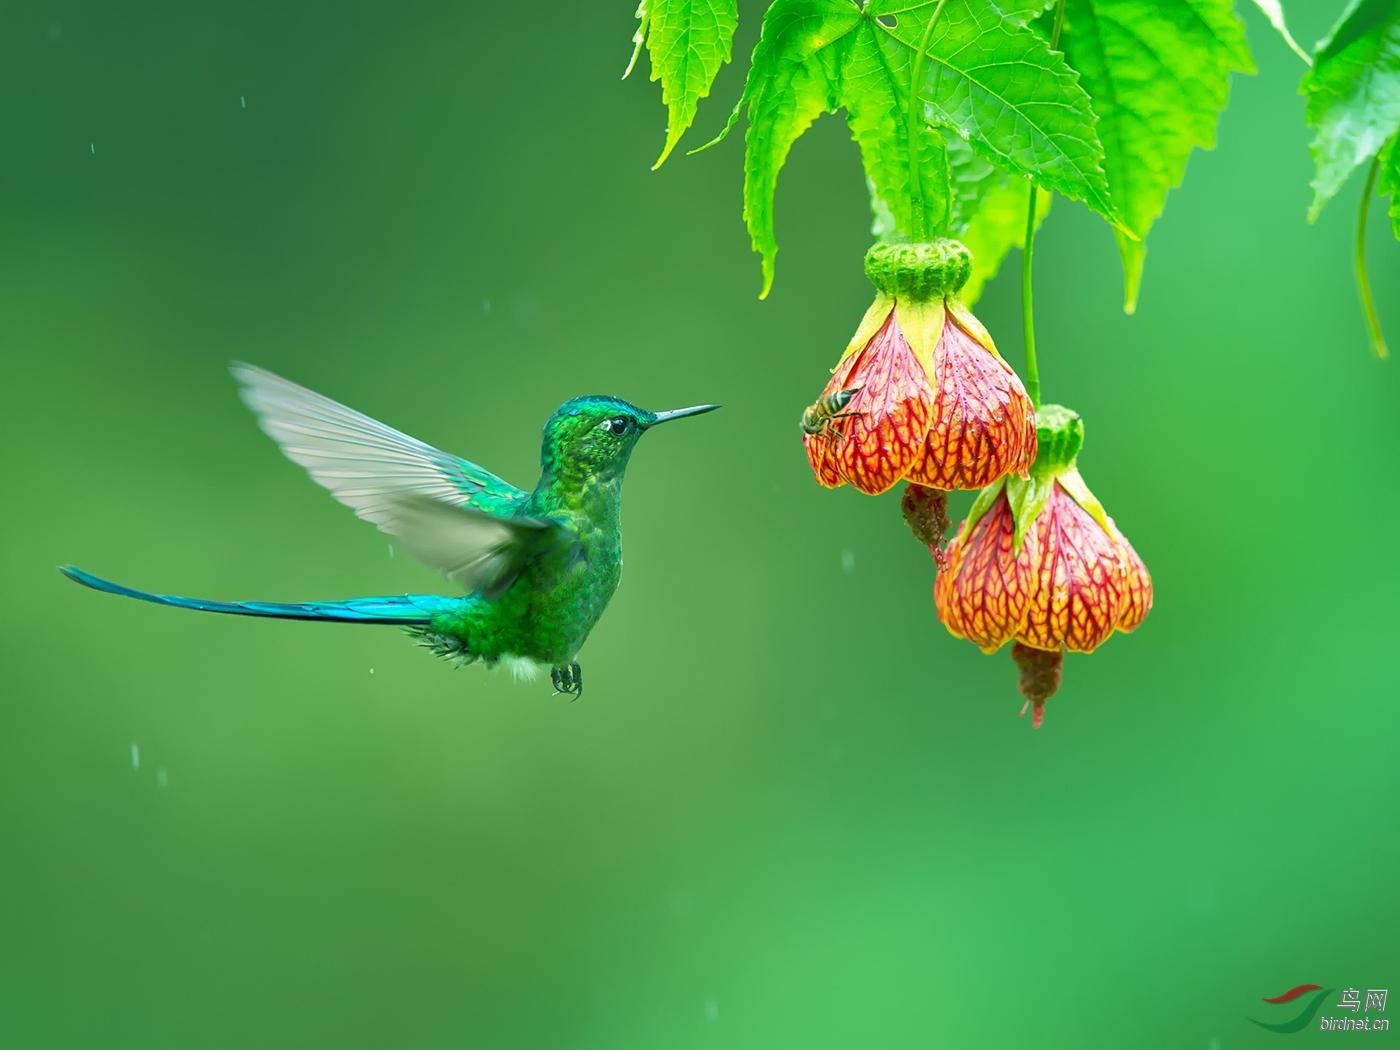 花蜜的诱惑Temptation Of Nectar--郭益民.jpg